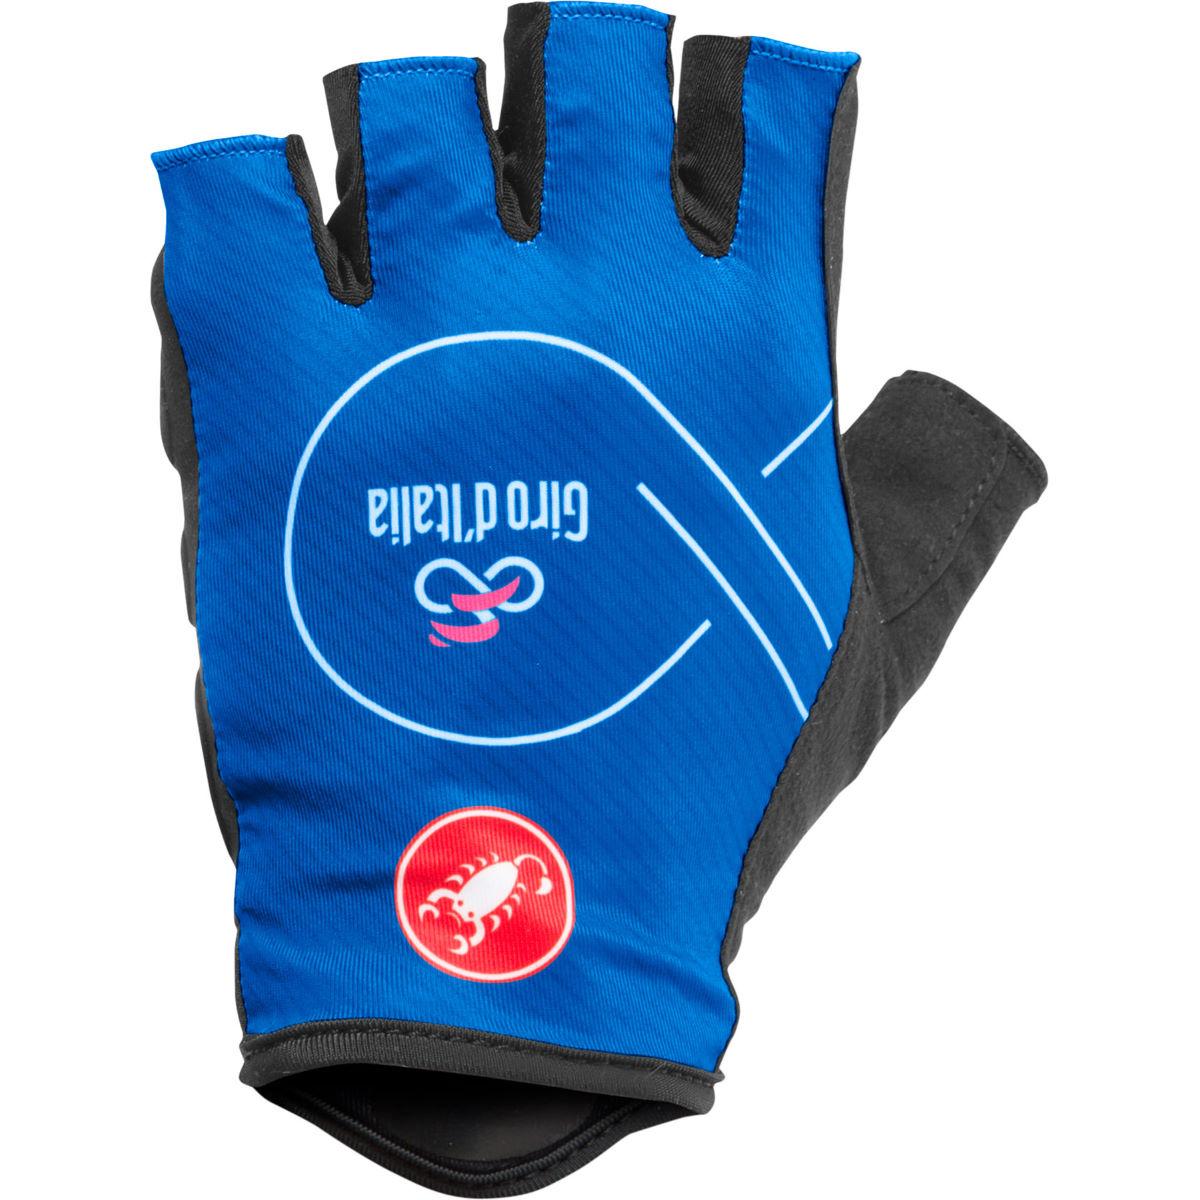 Castelli Giro D'Italia Gloves - L  Azzurro  | Short Finger Gloves http://bikes.net.au/t/2qDt #cycling